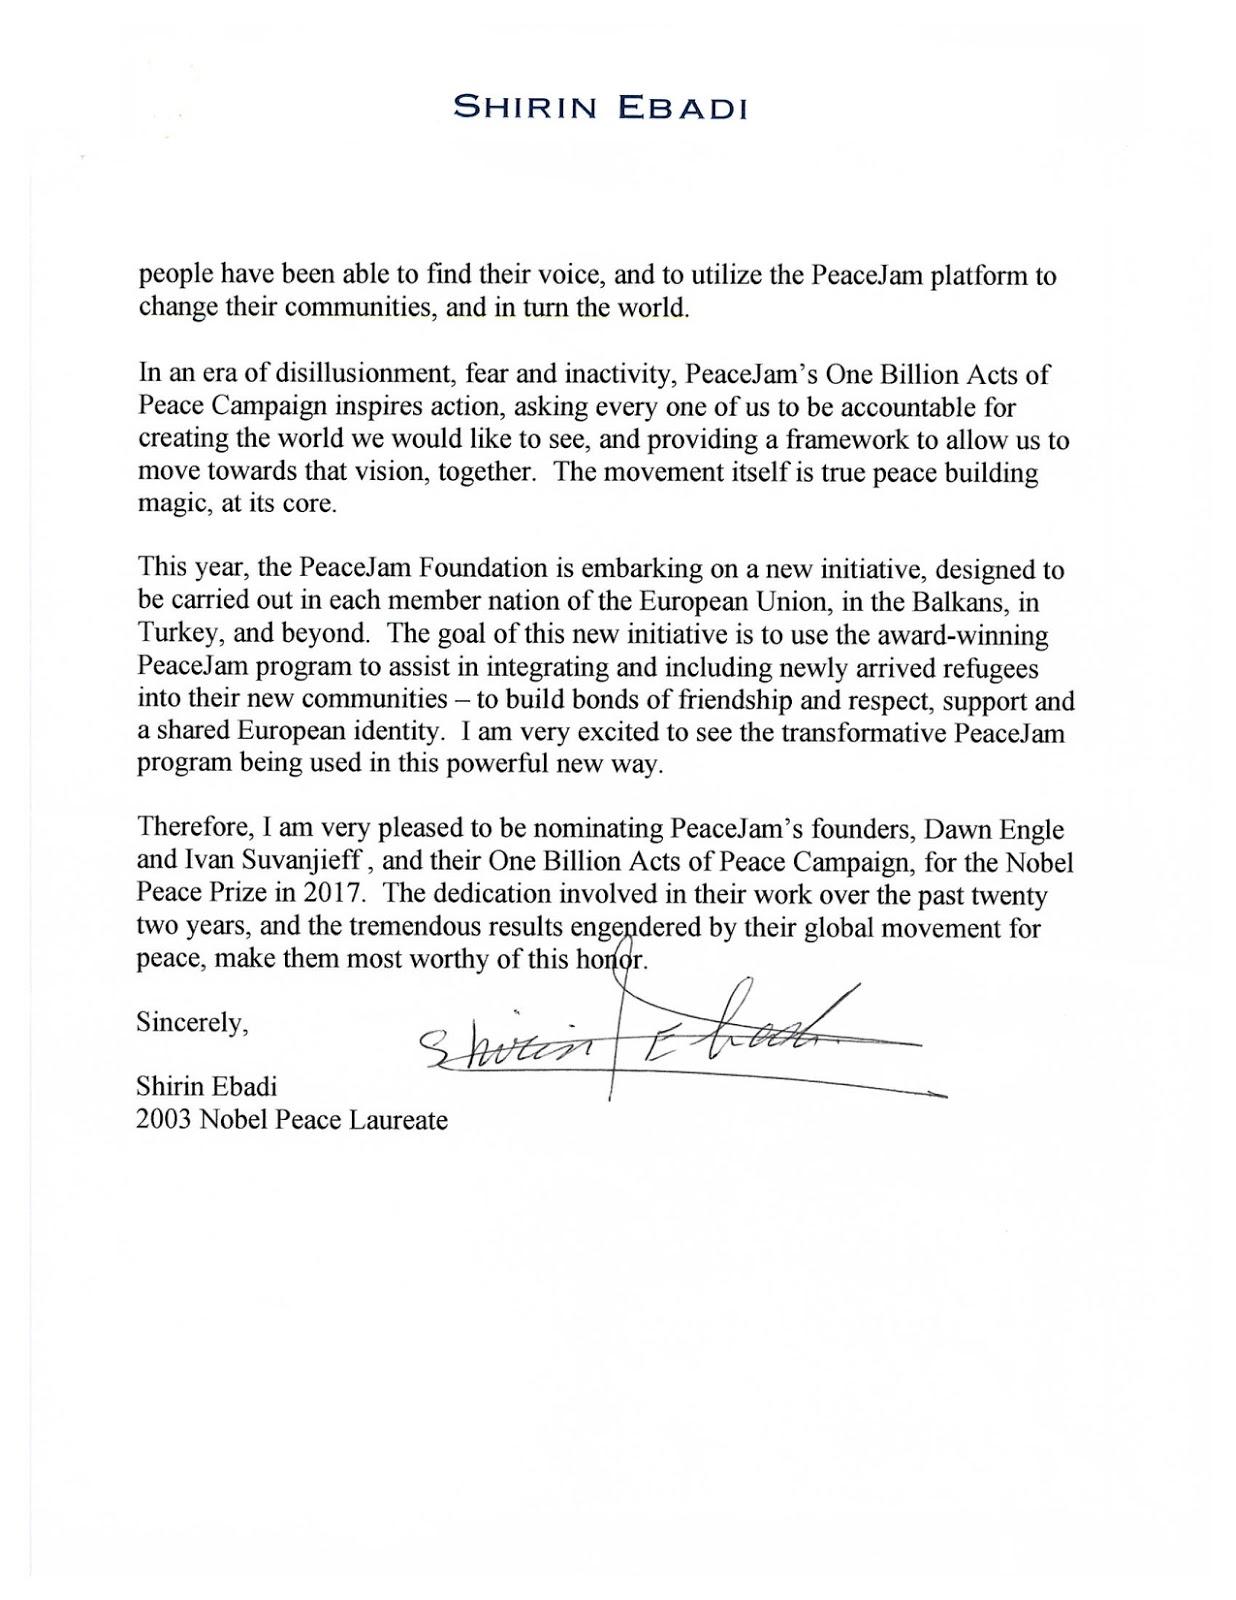 Stanford law cover letter sample